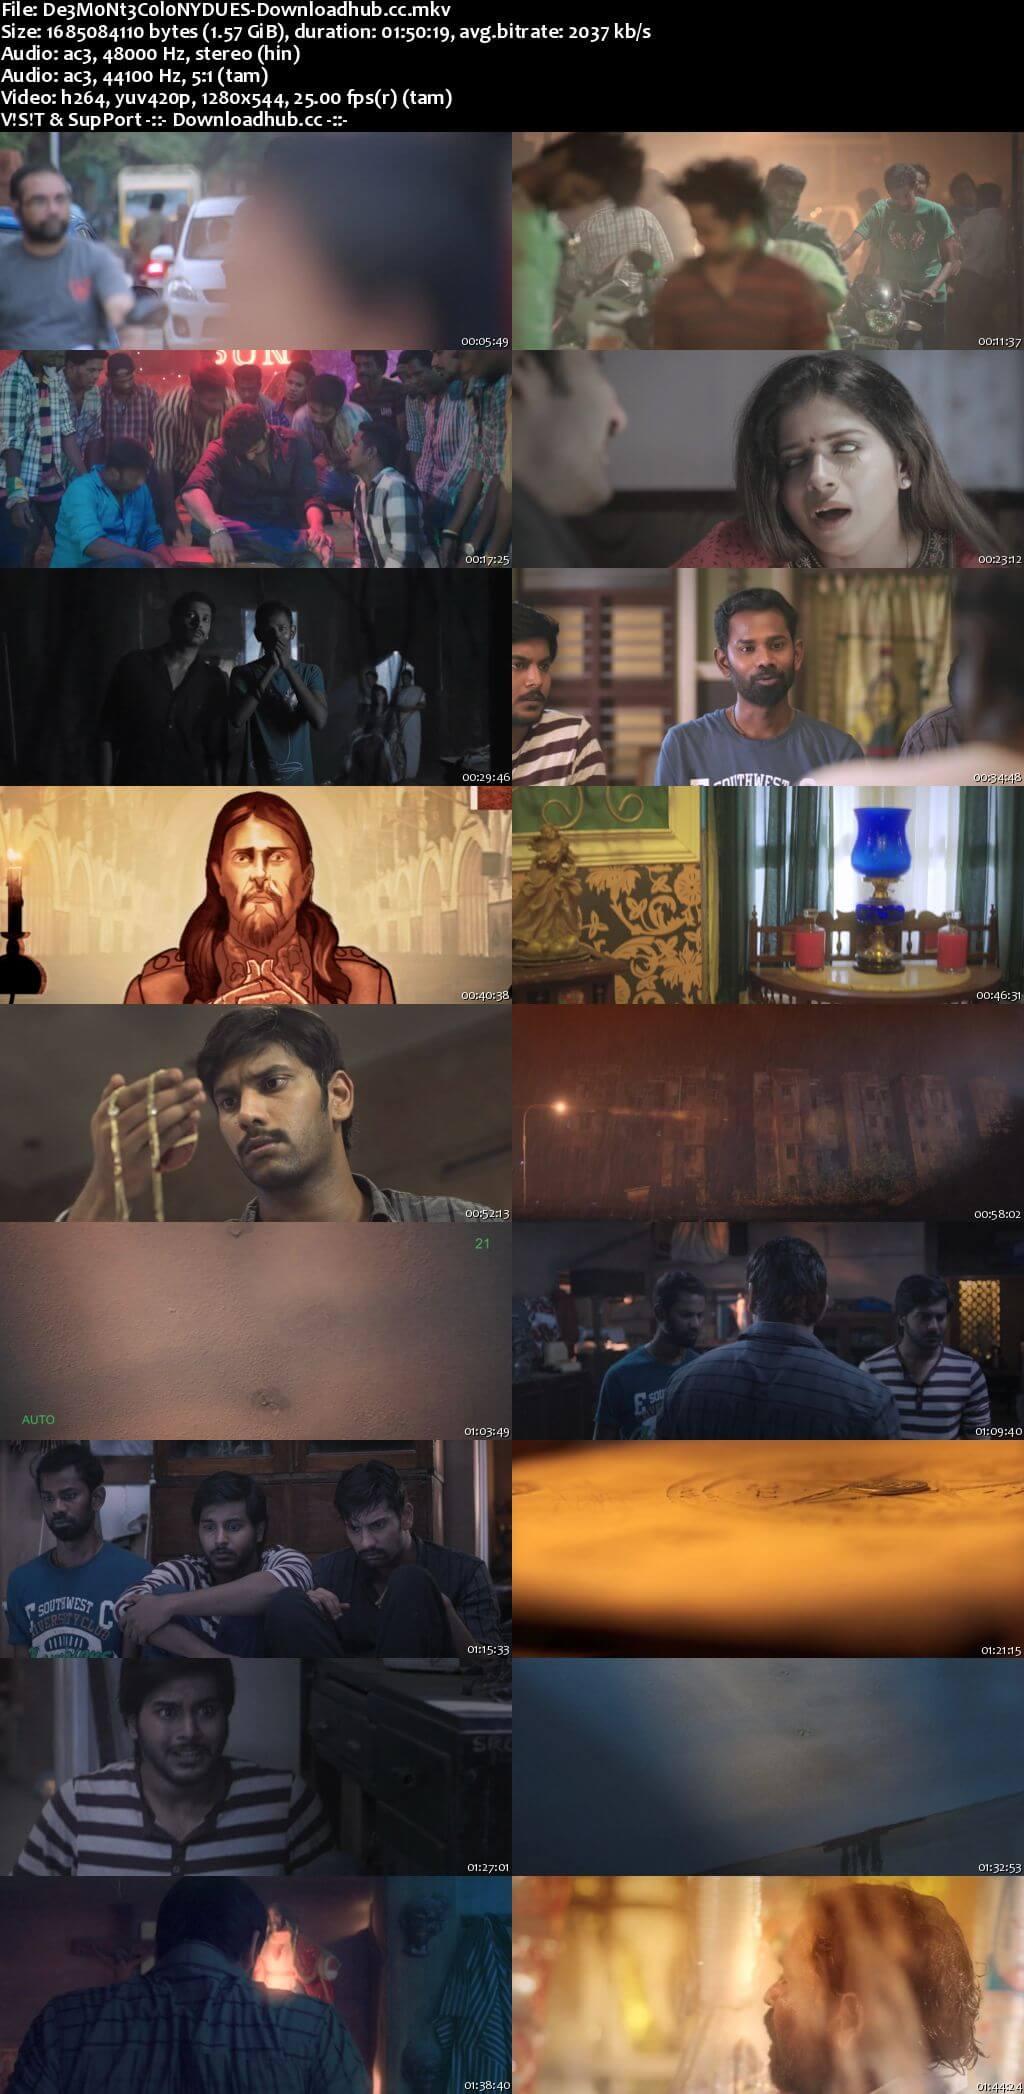 Demonte Colony 2015 Dual Audio 720p UNCUT HDRip [Hindi - Tamil] ESubs